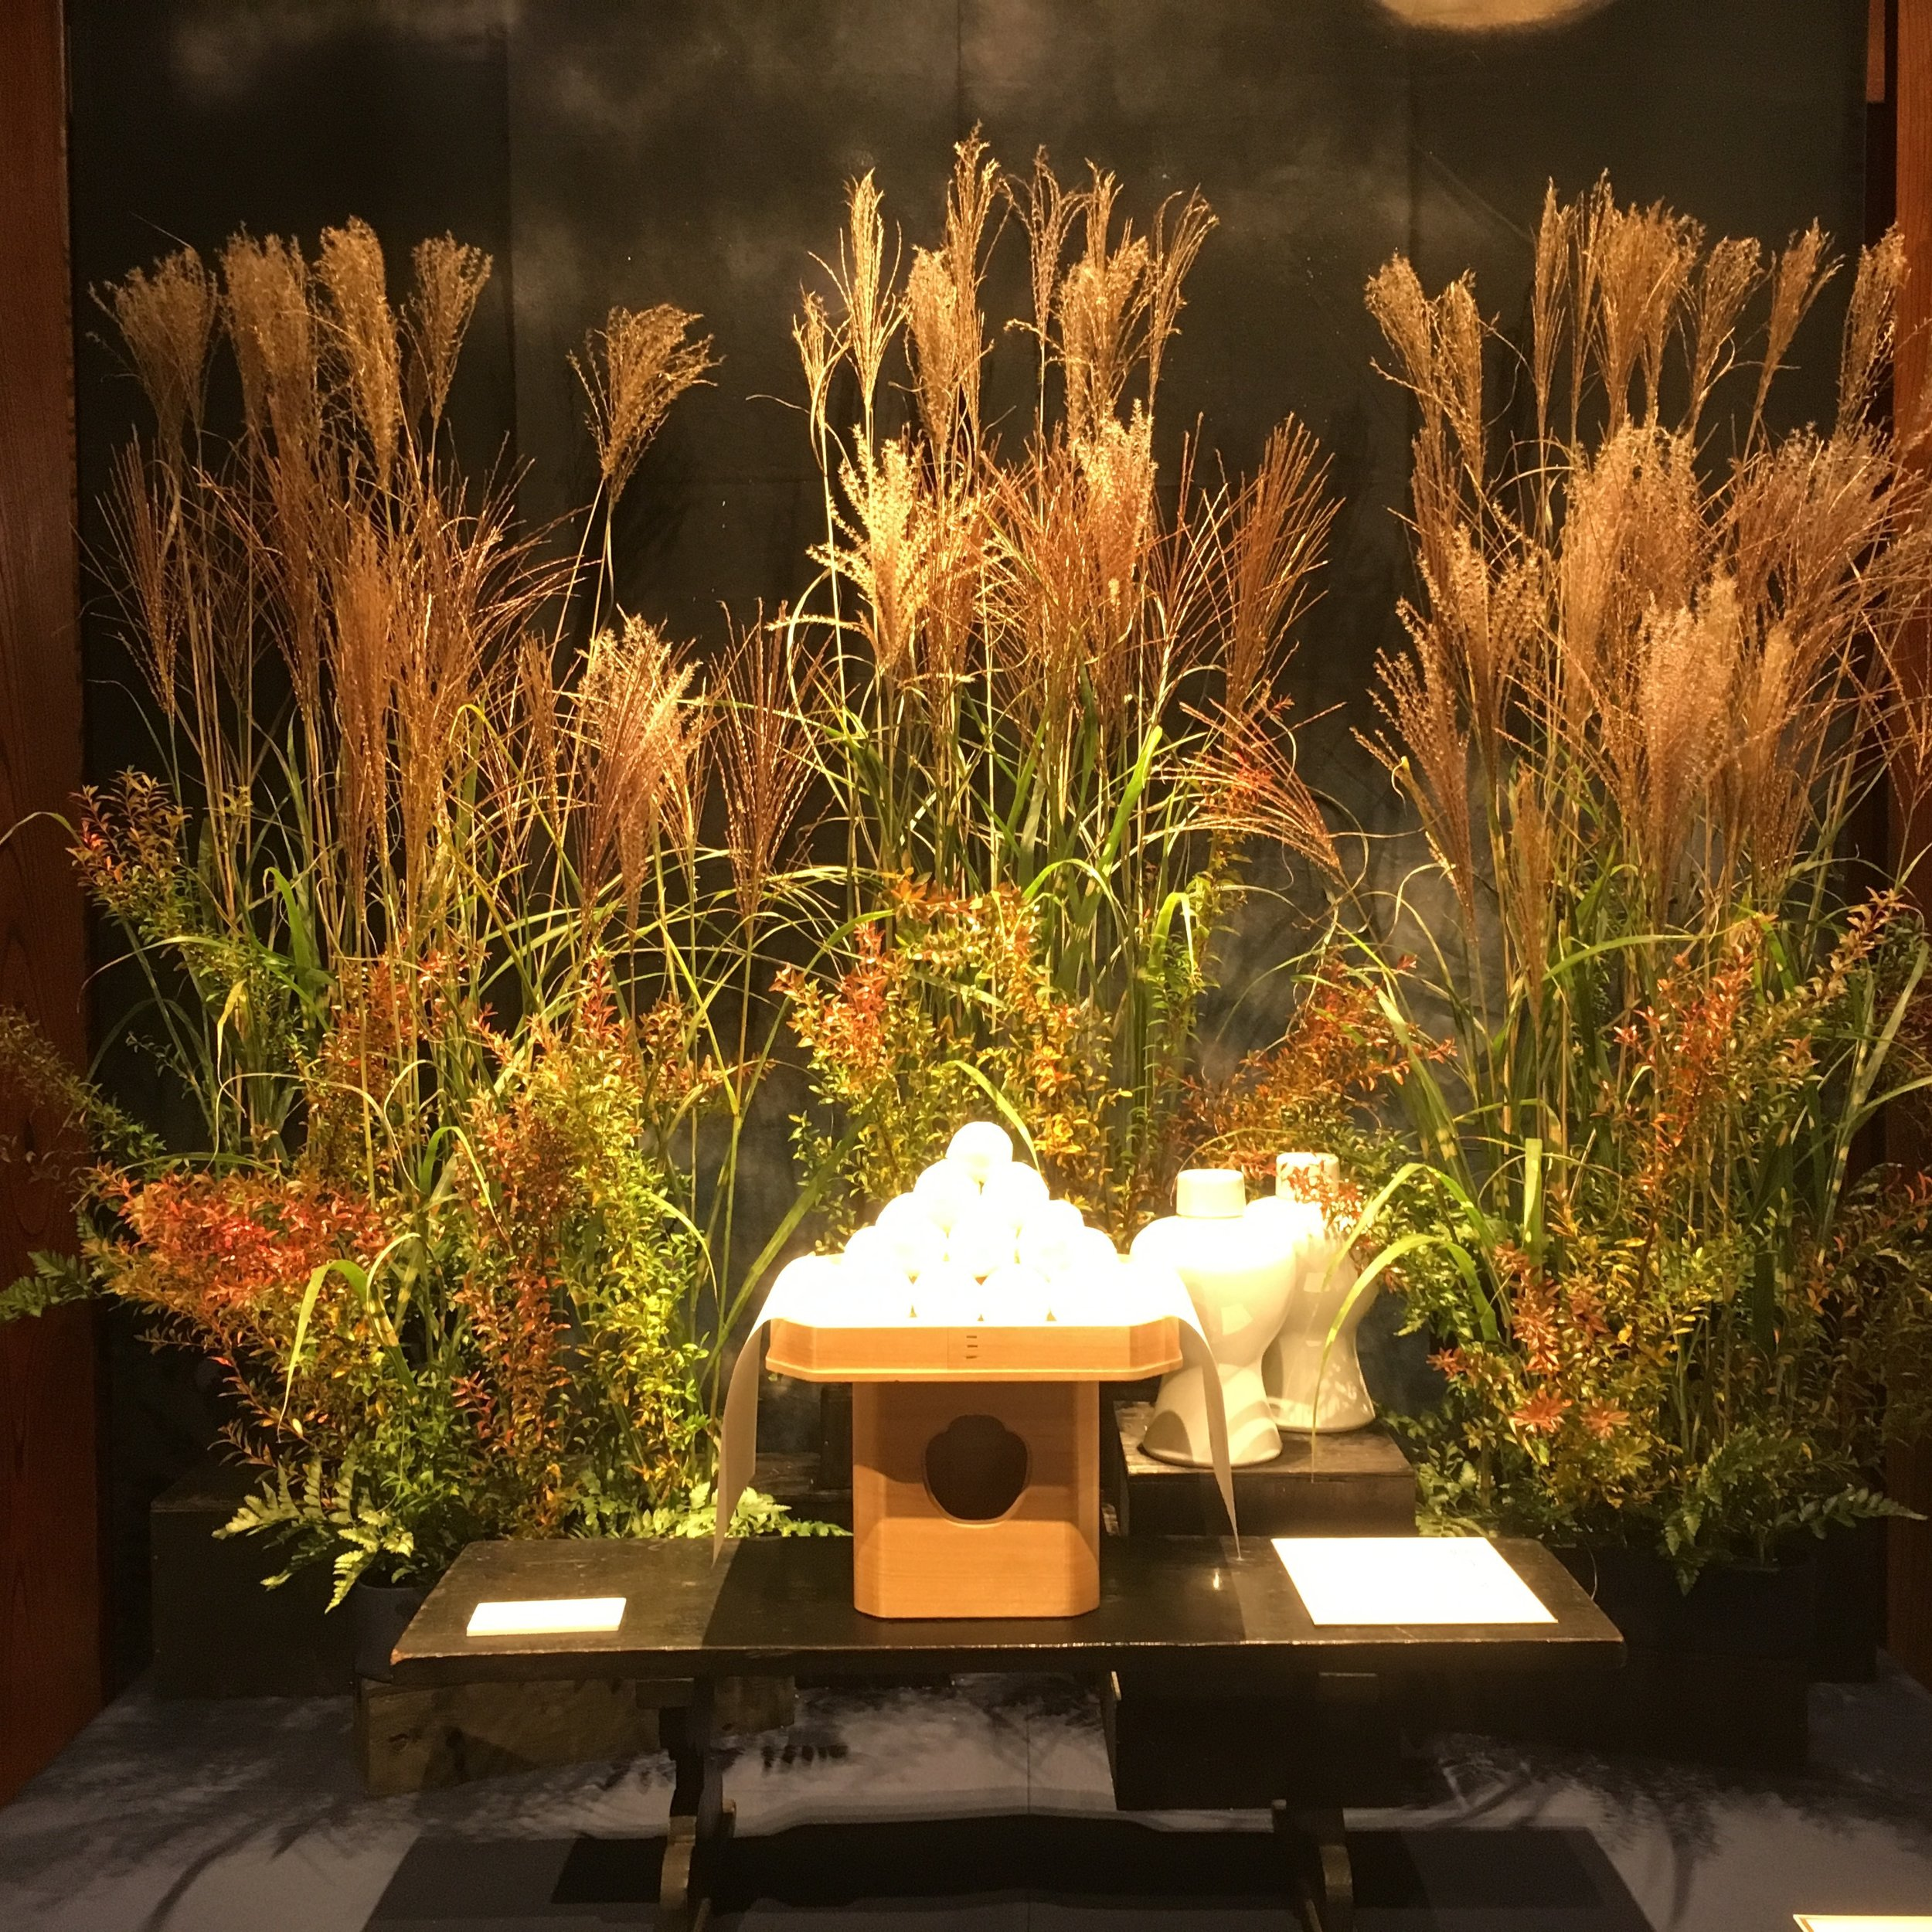 Vignette celebrating harvest time of rice plants